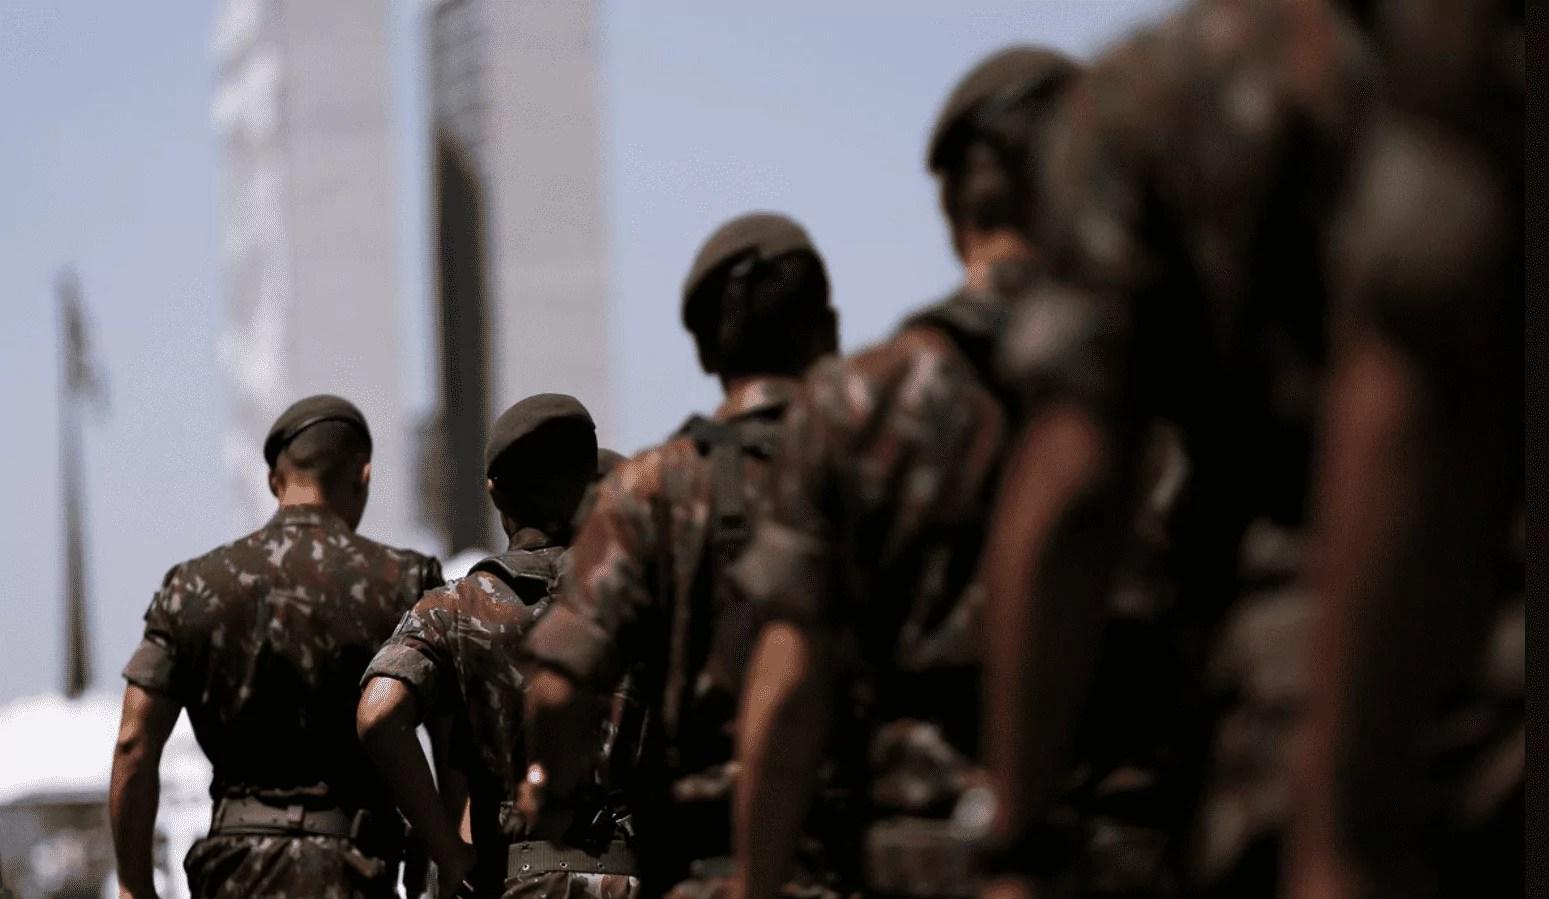 Foto mostra agentes militares